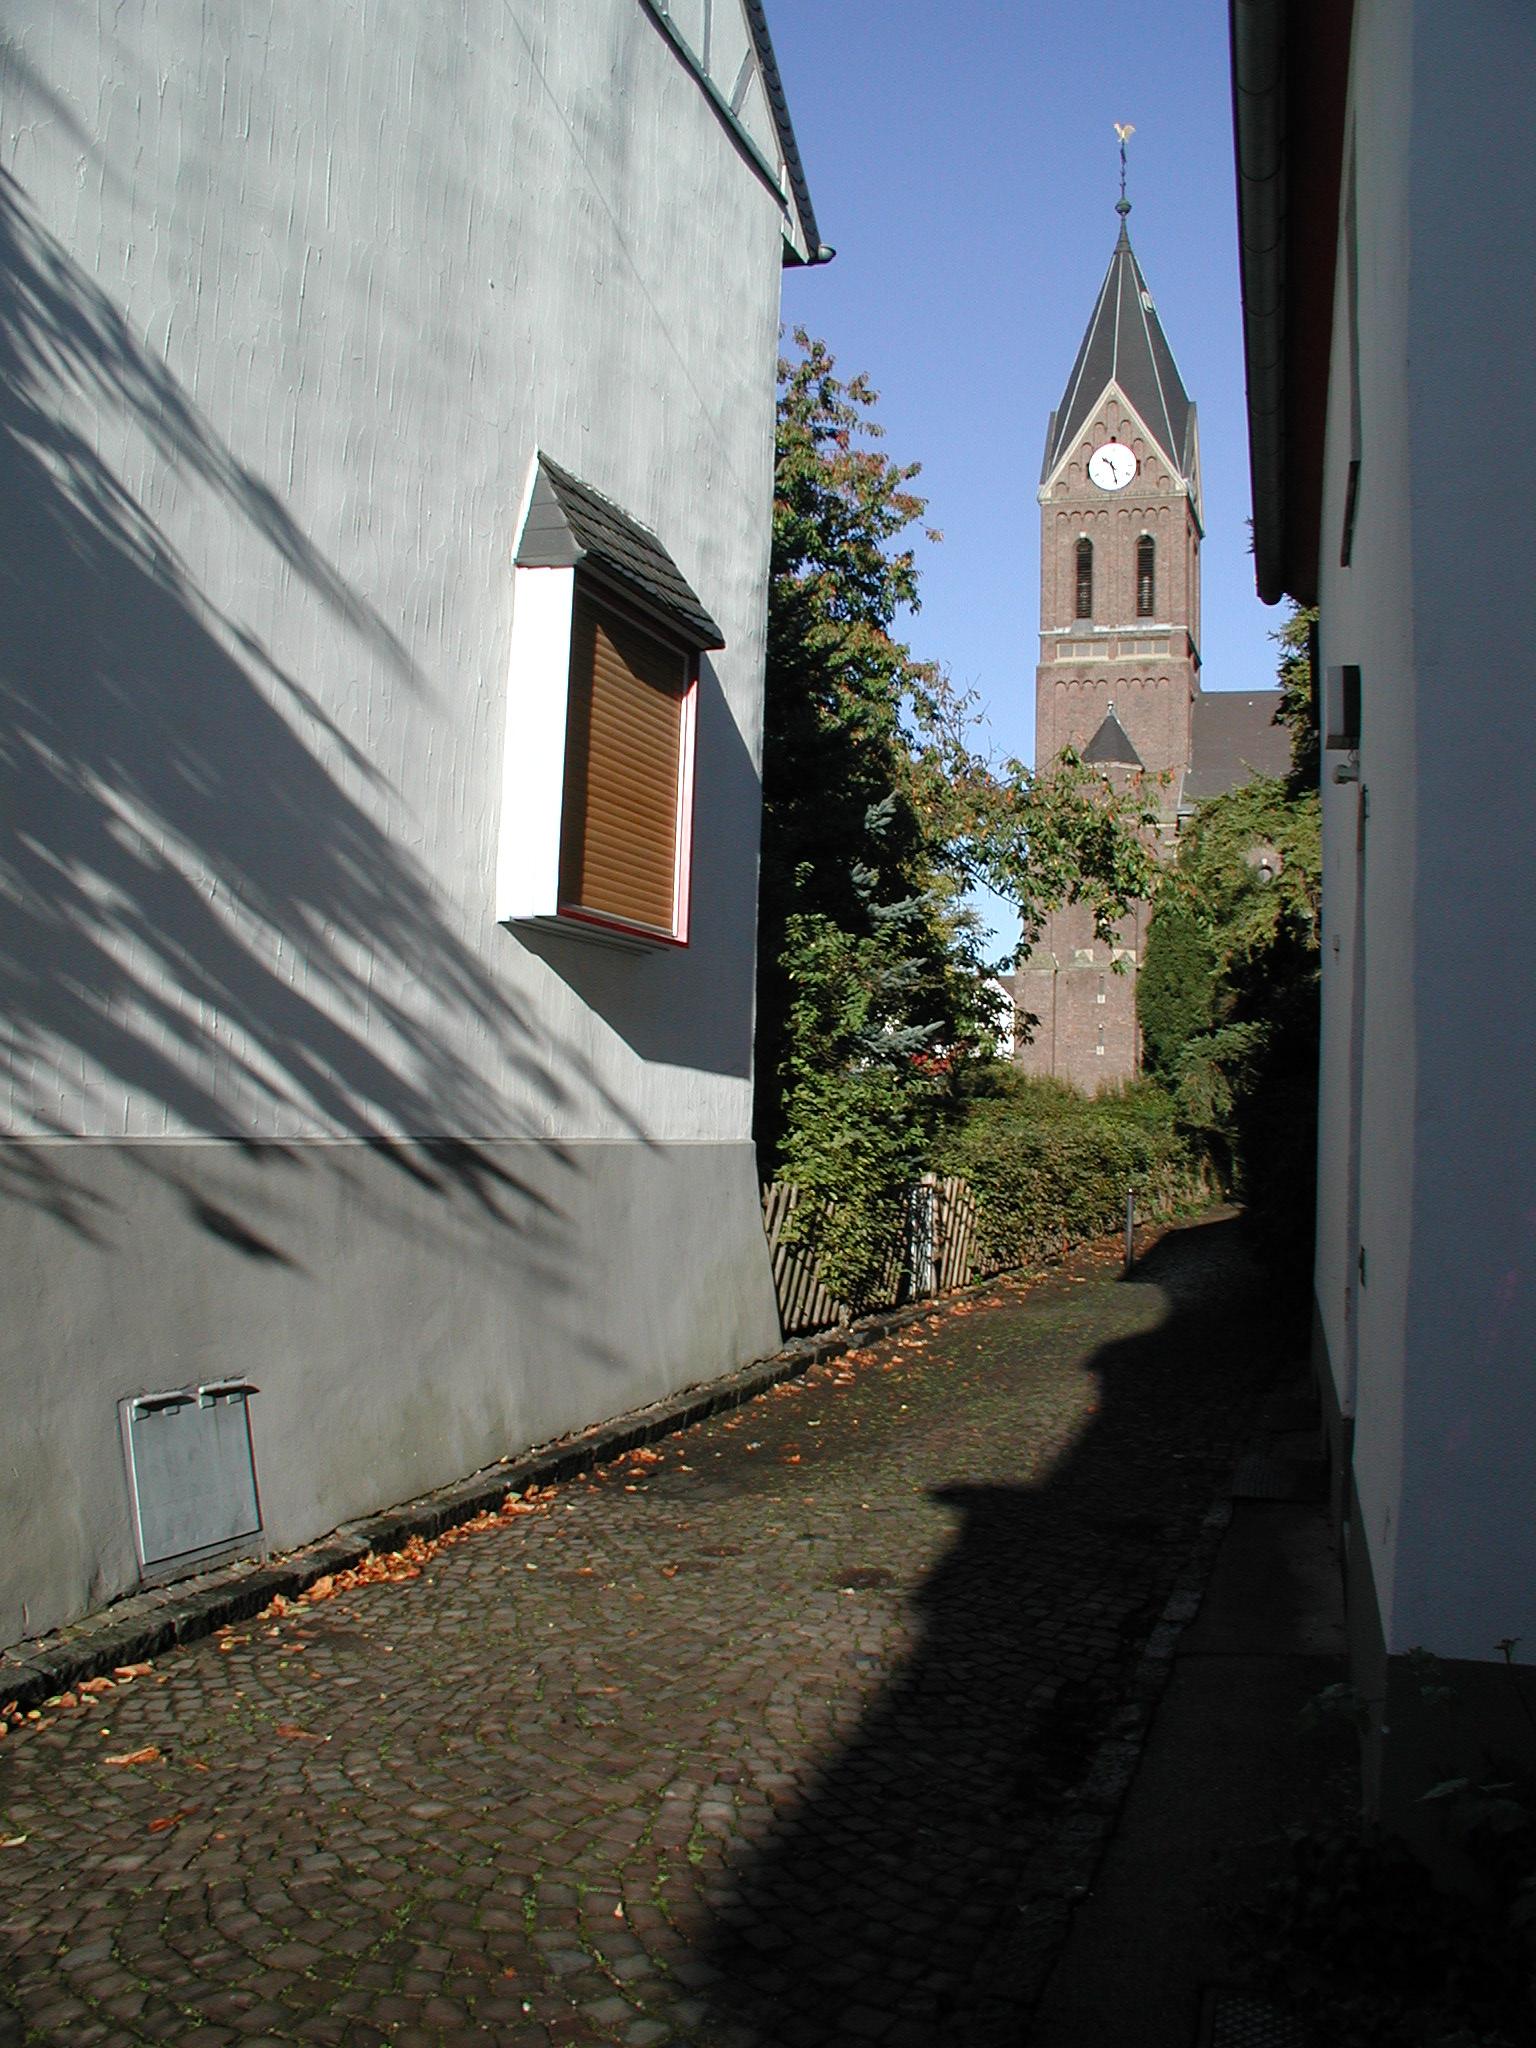 File:Alt-Huerth-PA200009.JPG - Wikimedia Commons